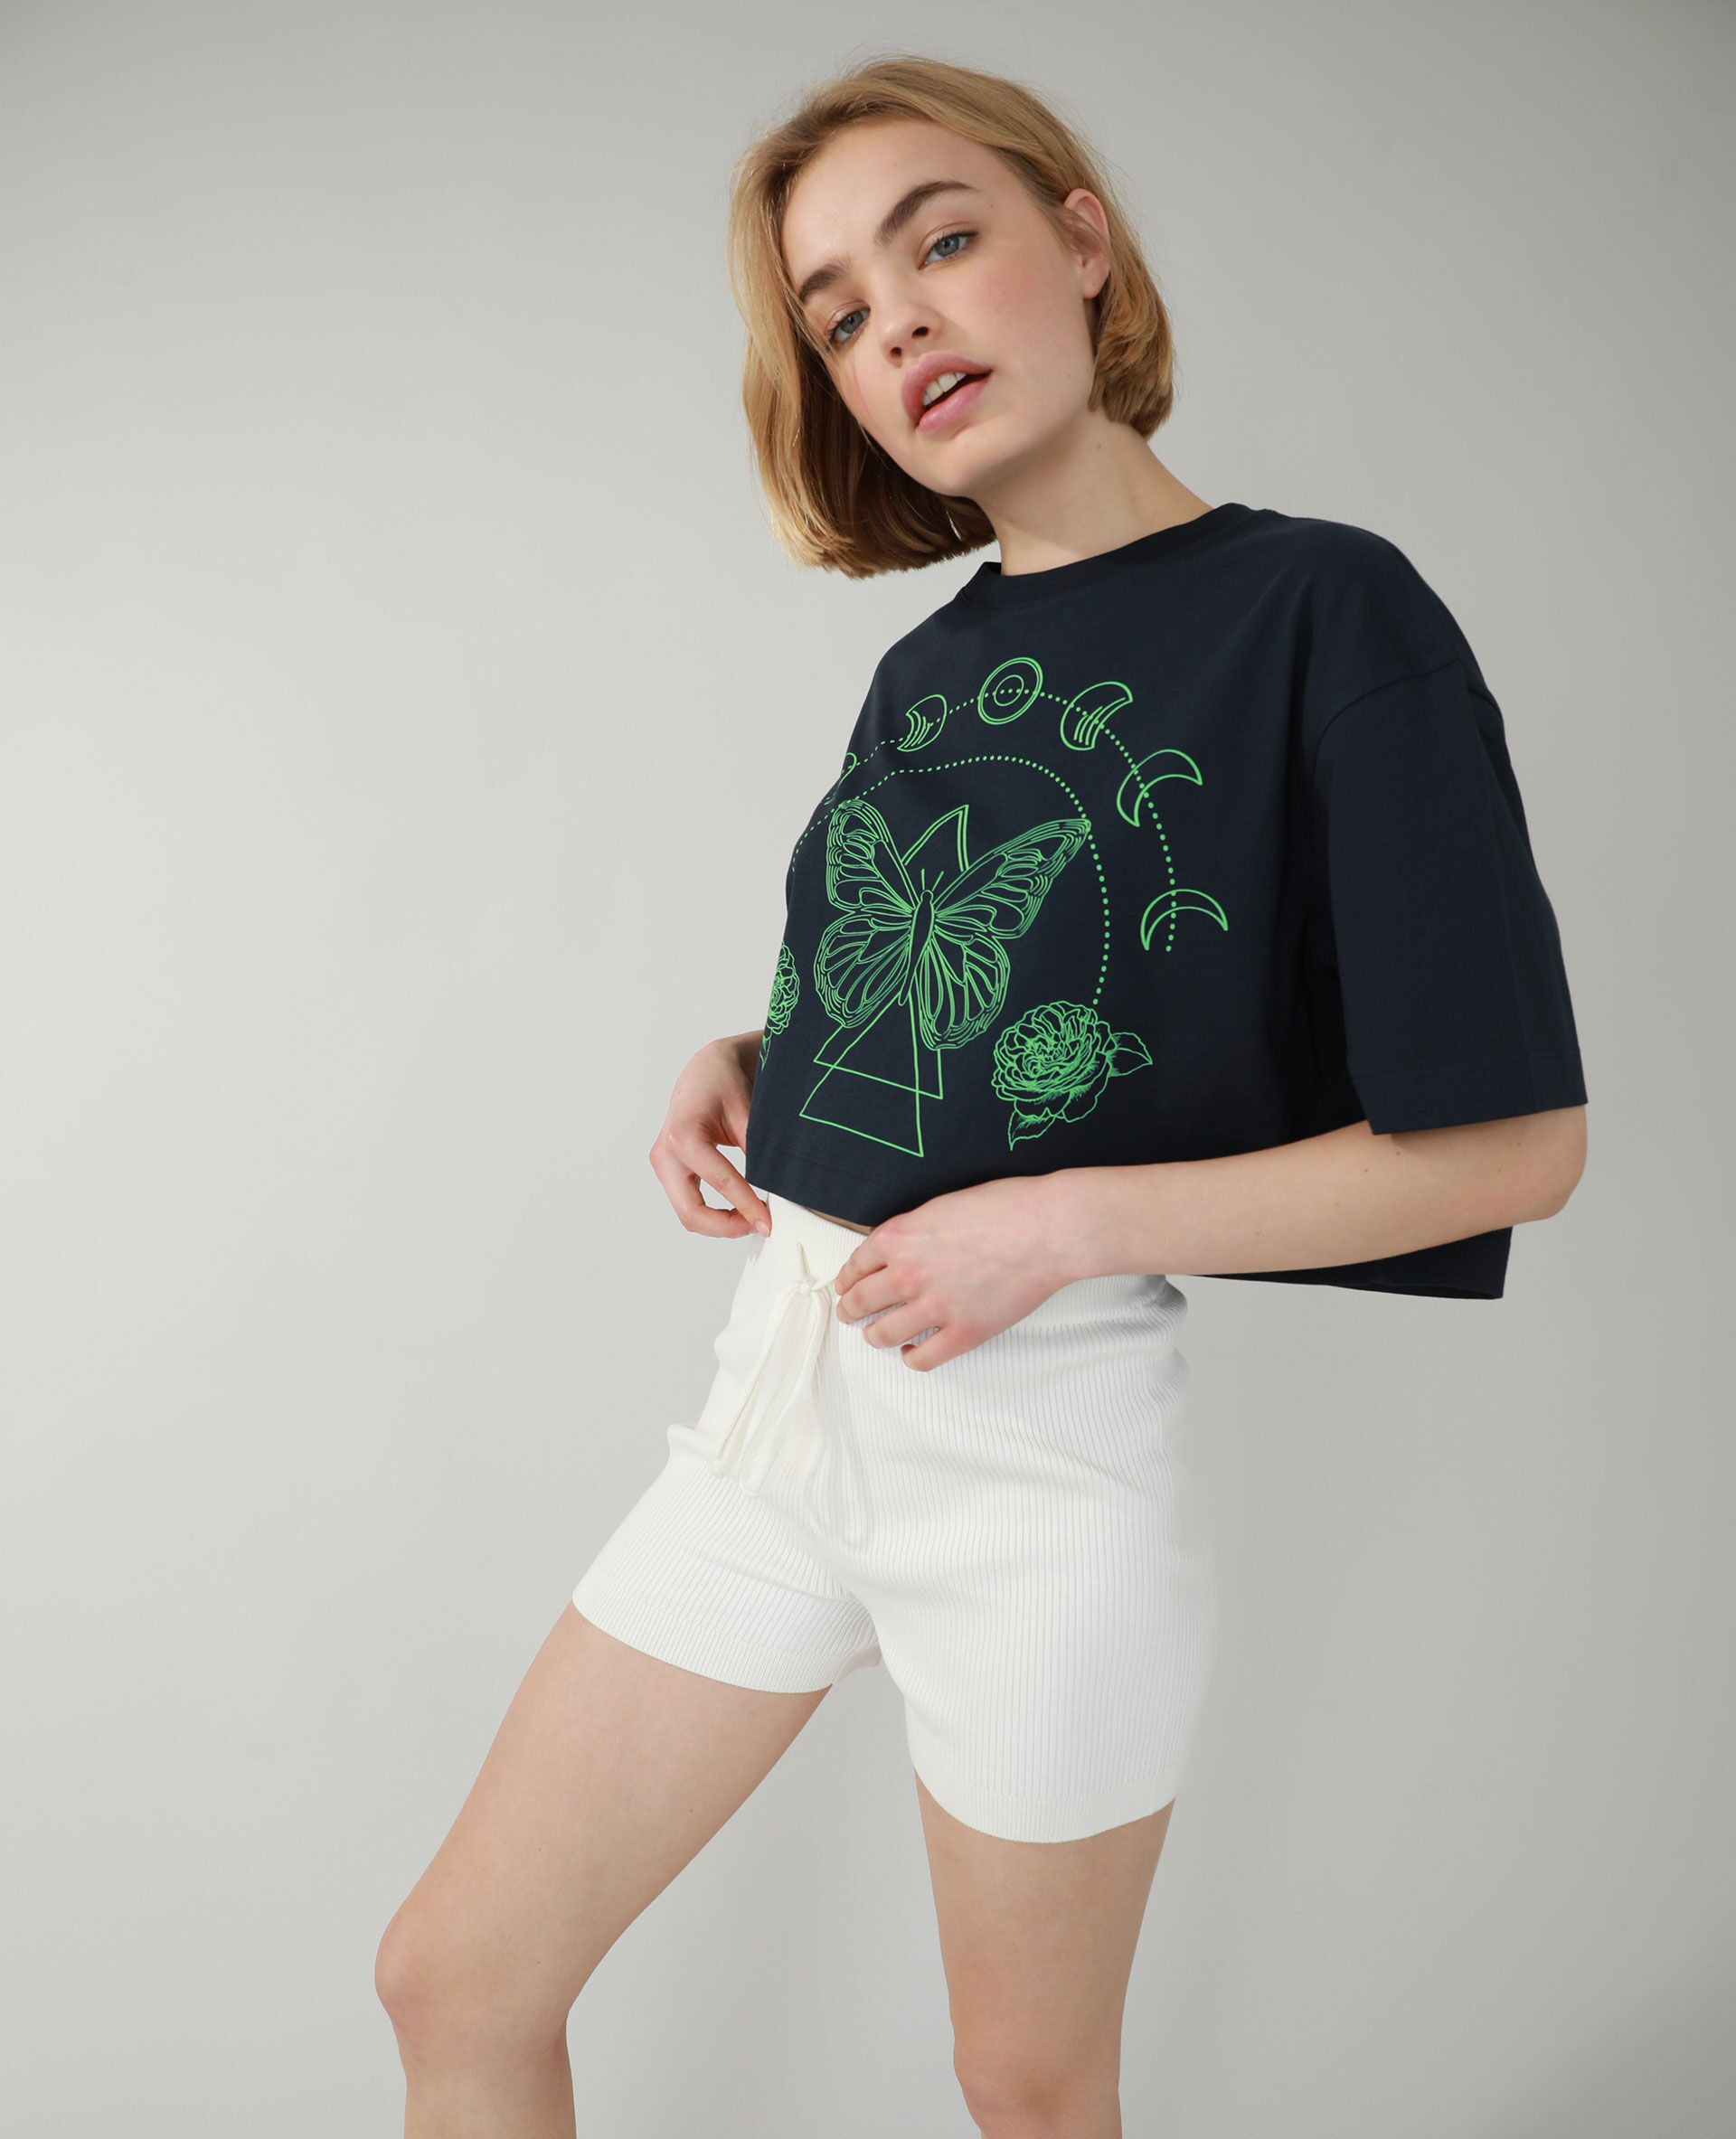 T-shirt cropped Femme - Couleur bleu marine - Taille L - PIMKIE - MODE FEMME